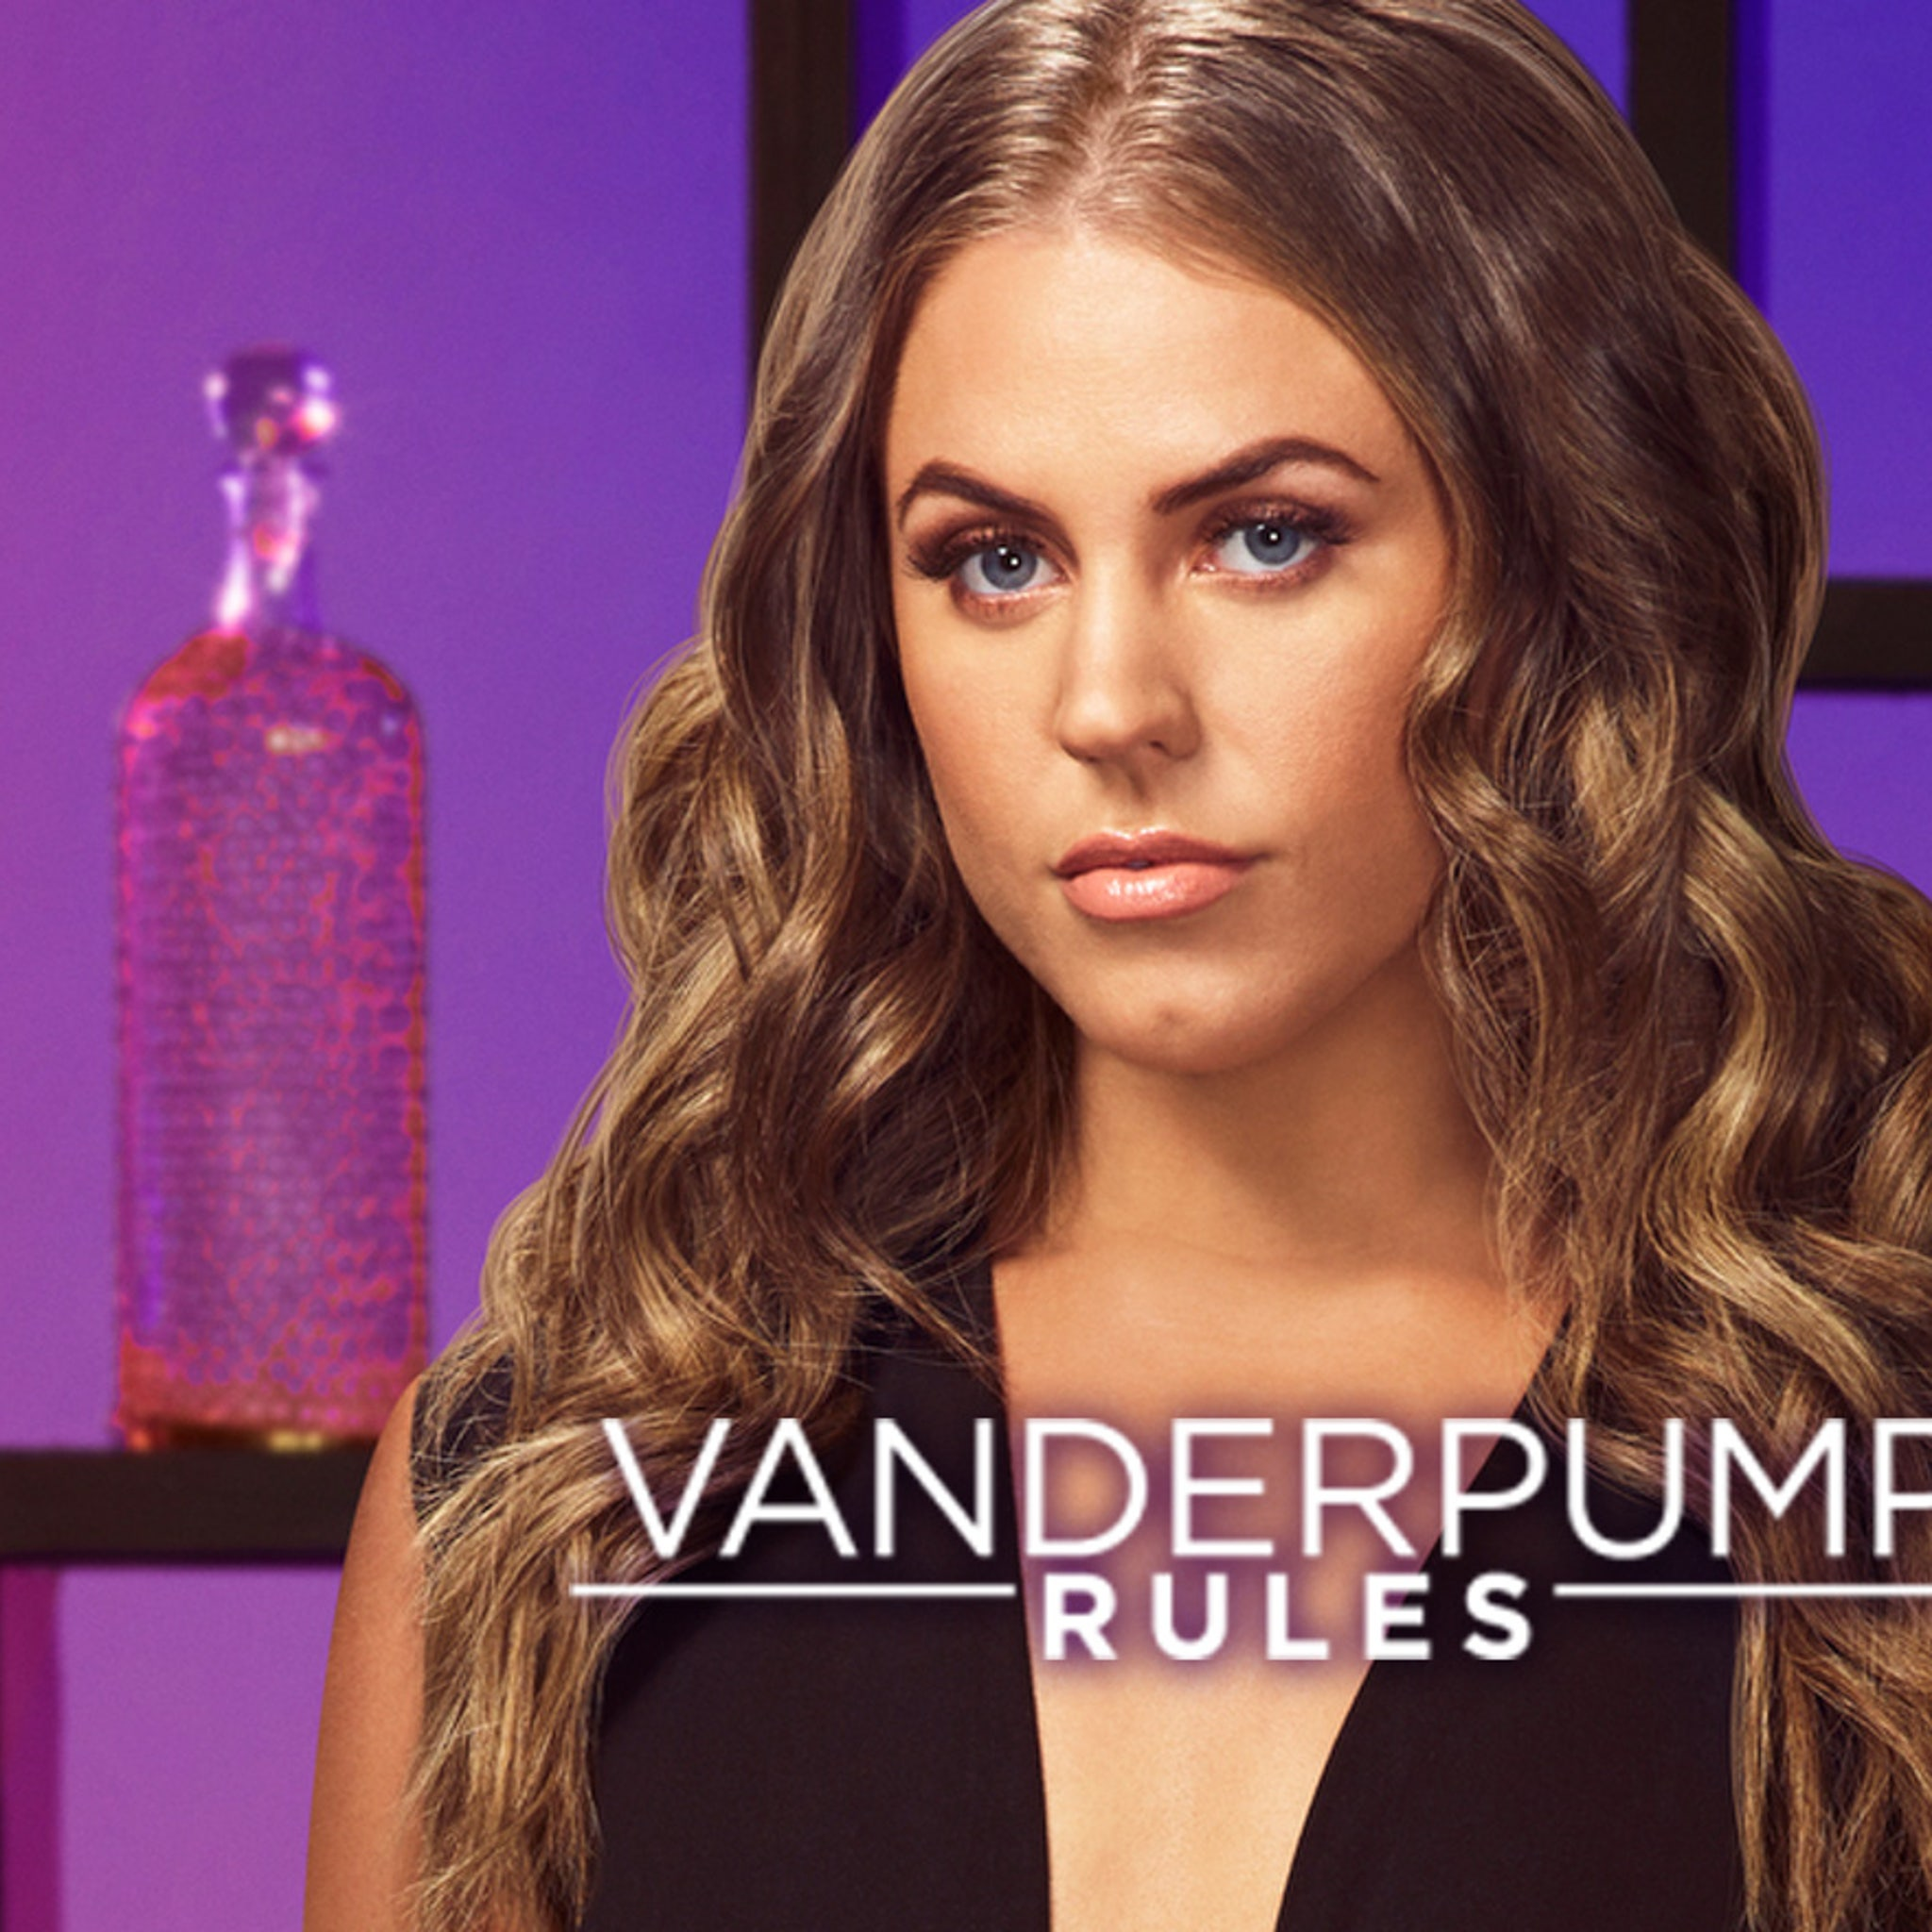 Vanderpump Rules Cast Wants Danica Dow Gone After Tro Drama